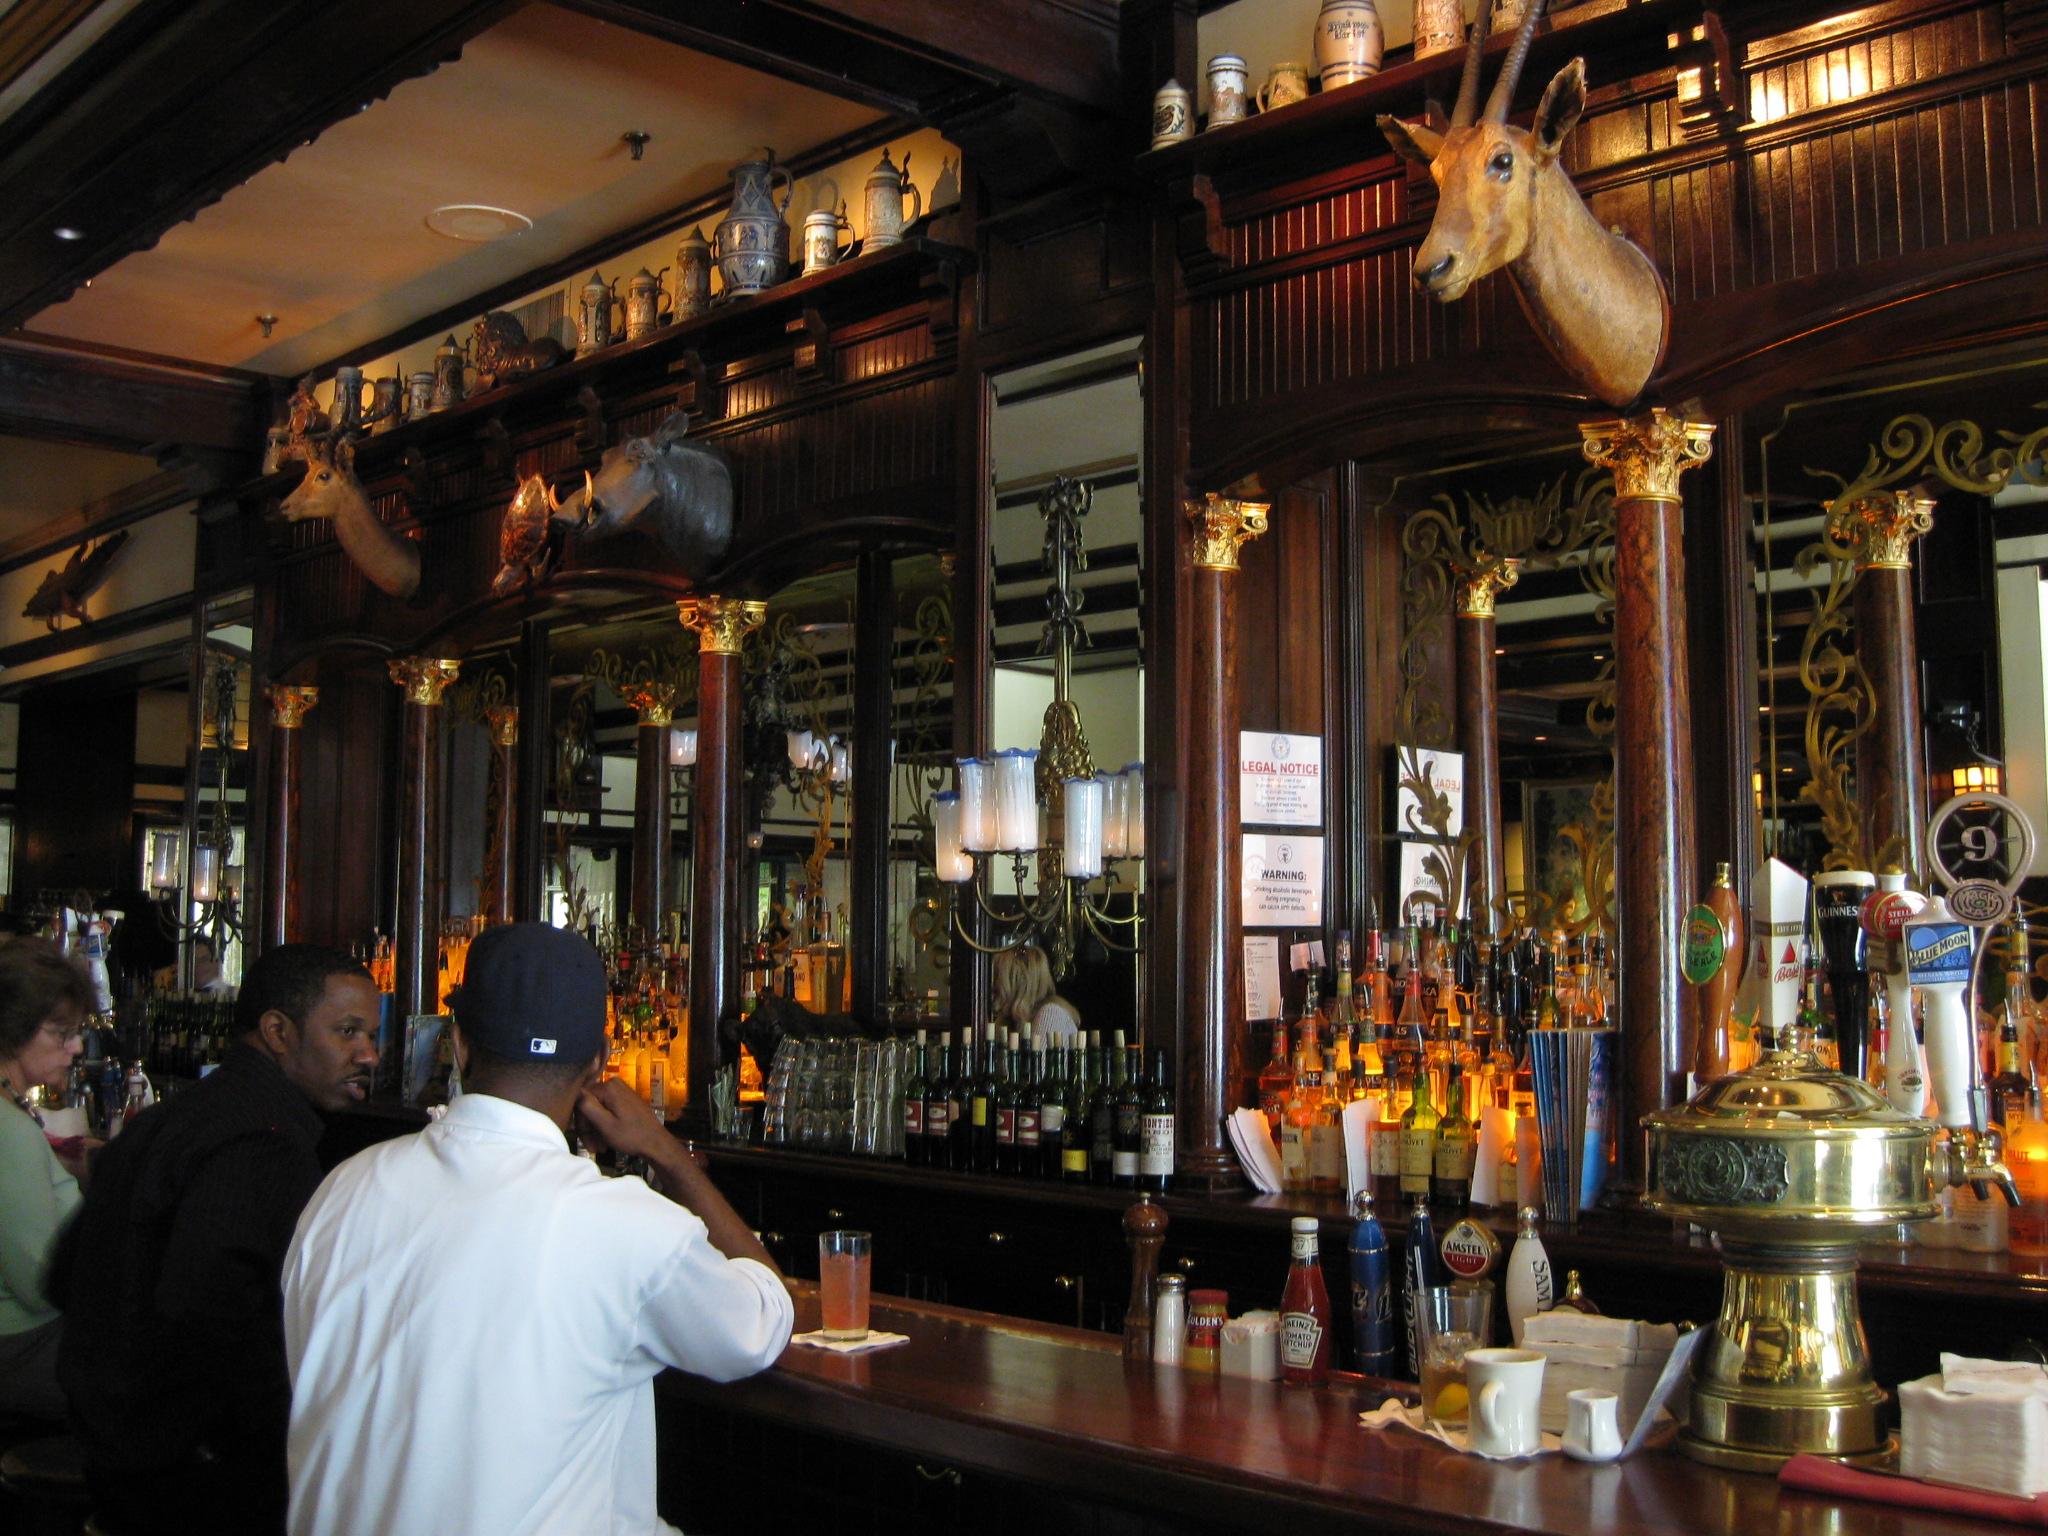 10 Great Bars In Chicago's Ukrainian Village